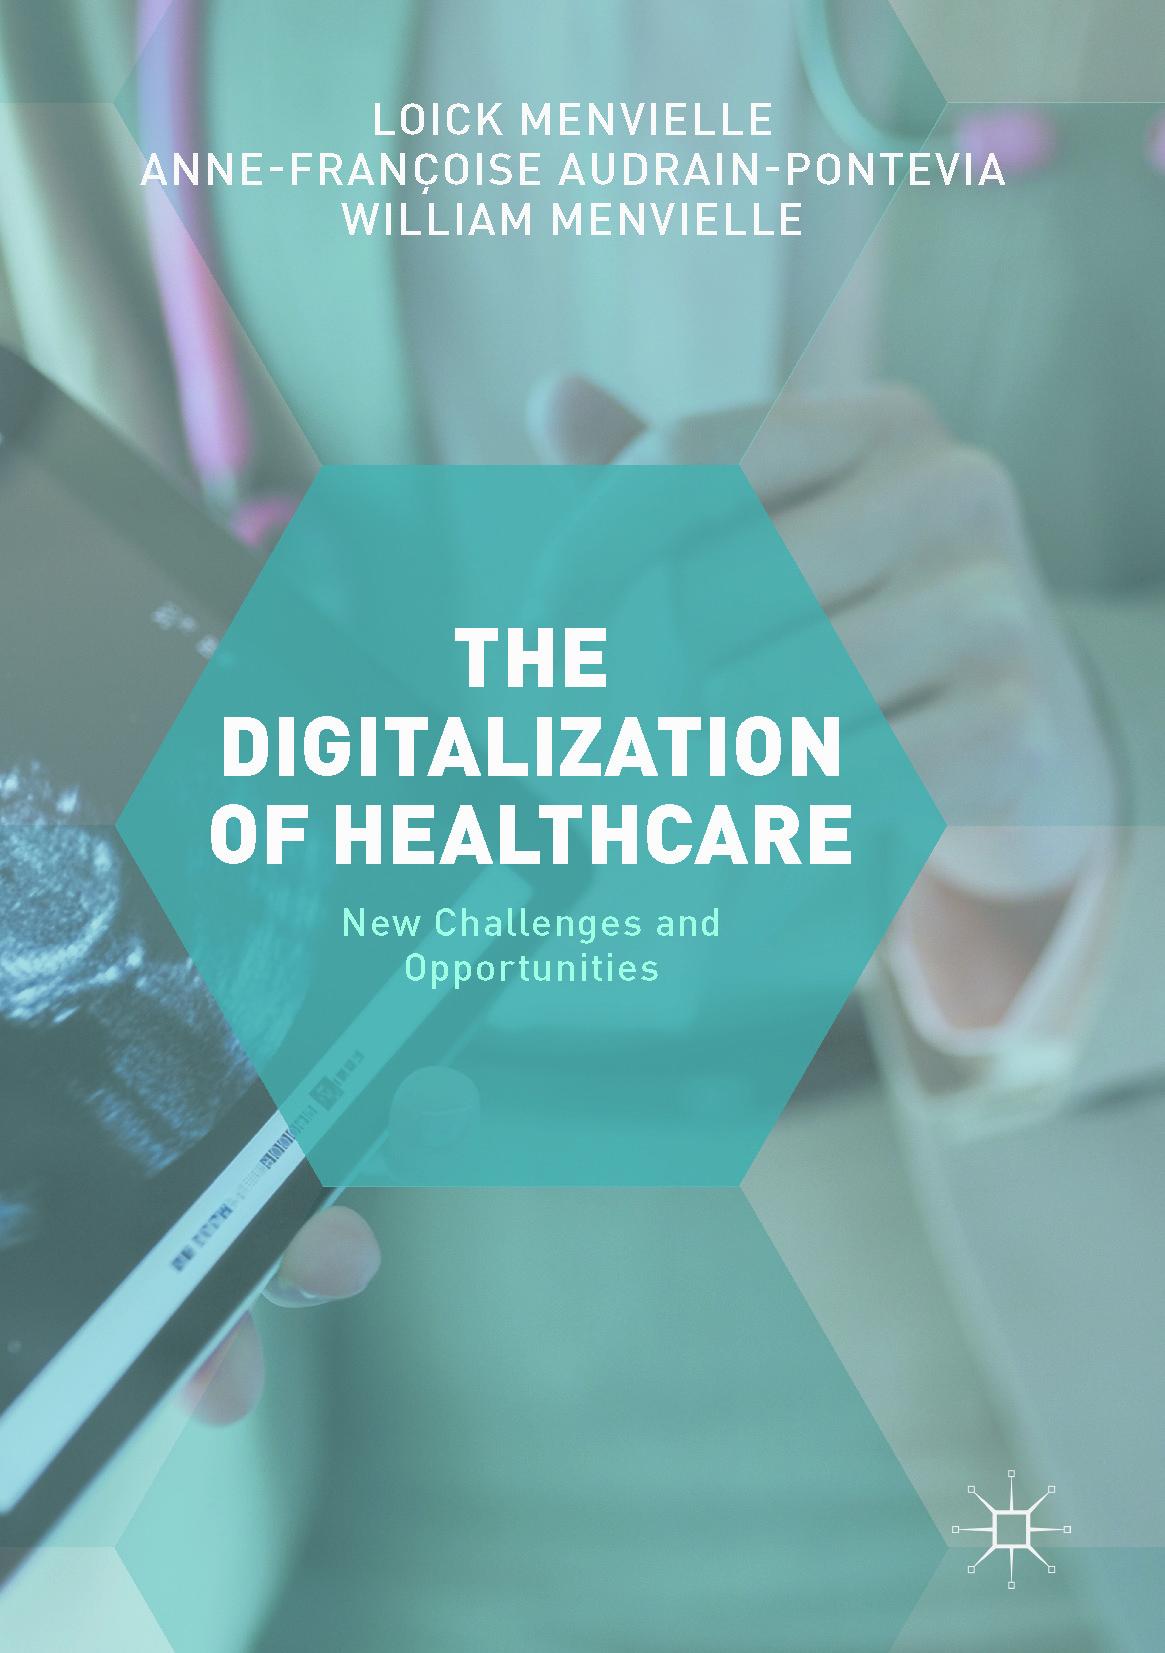 Audrain-Pontevia, Anne-Françoise - The Digitization of Healthcare, ebook